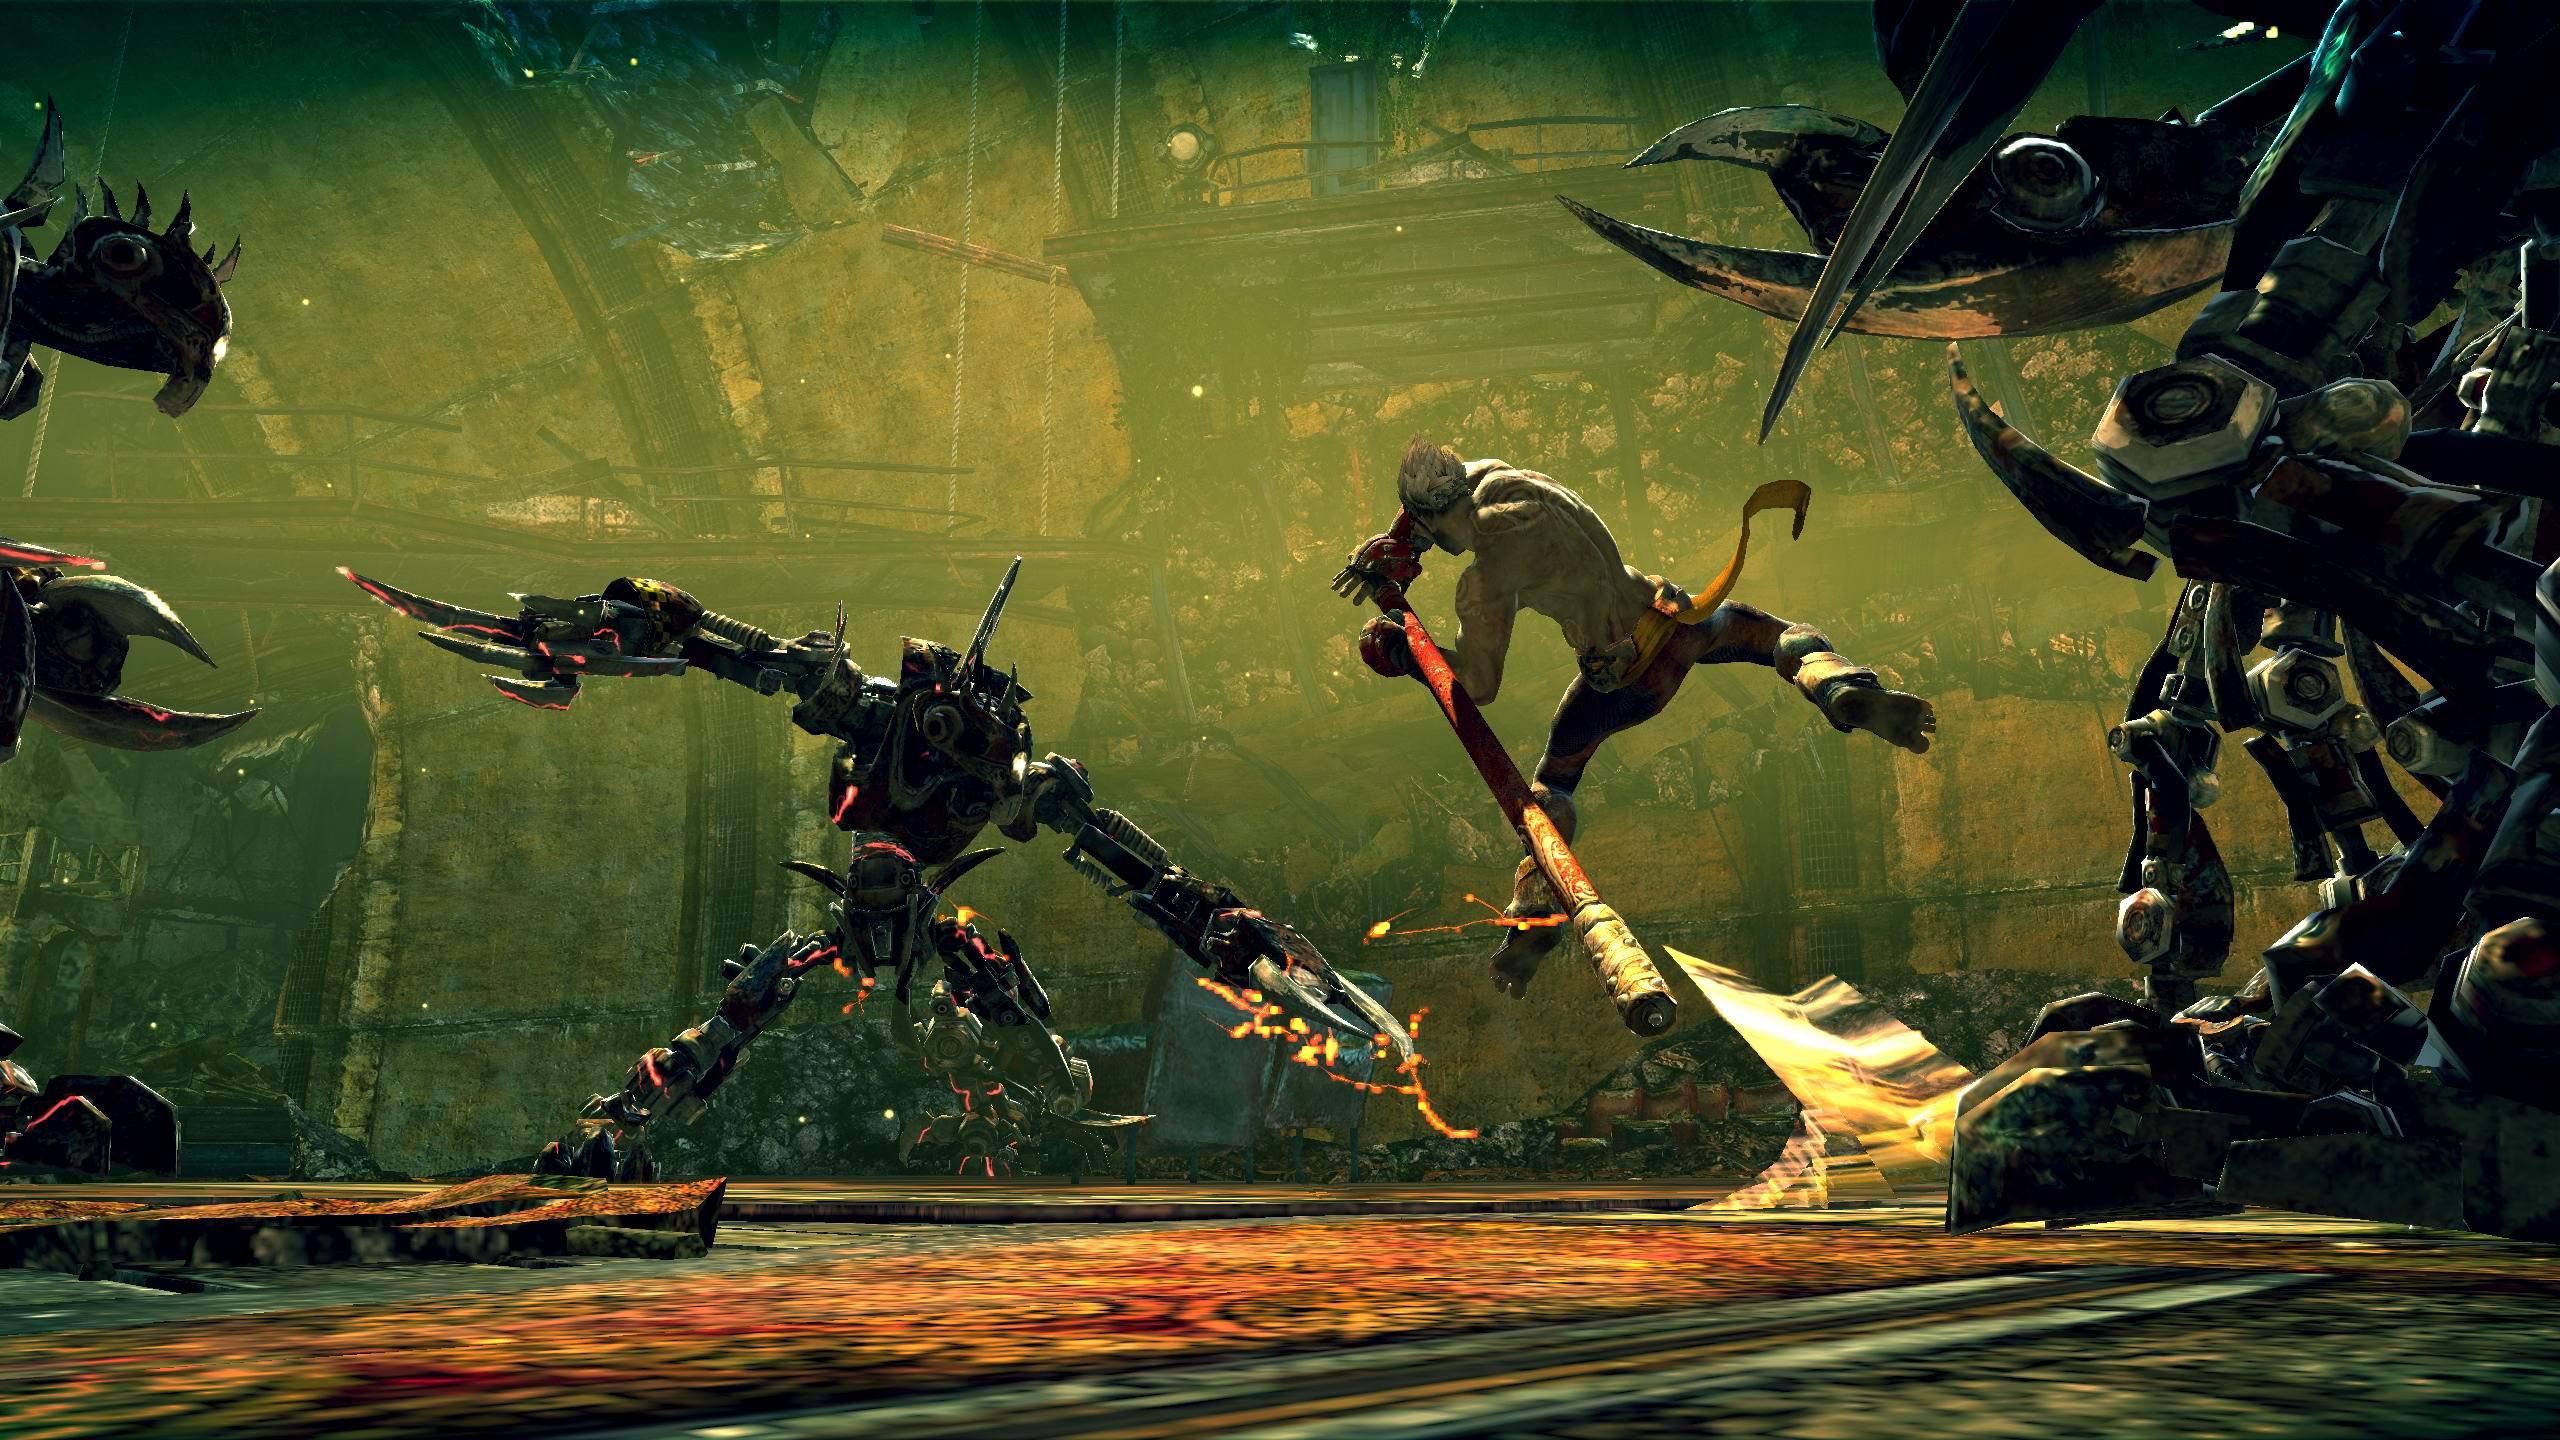 [Update: Confirmed for PS3/PC] Rumor - Enslaved: Odyssey ...